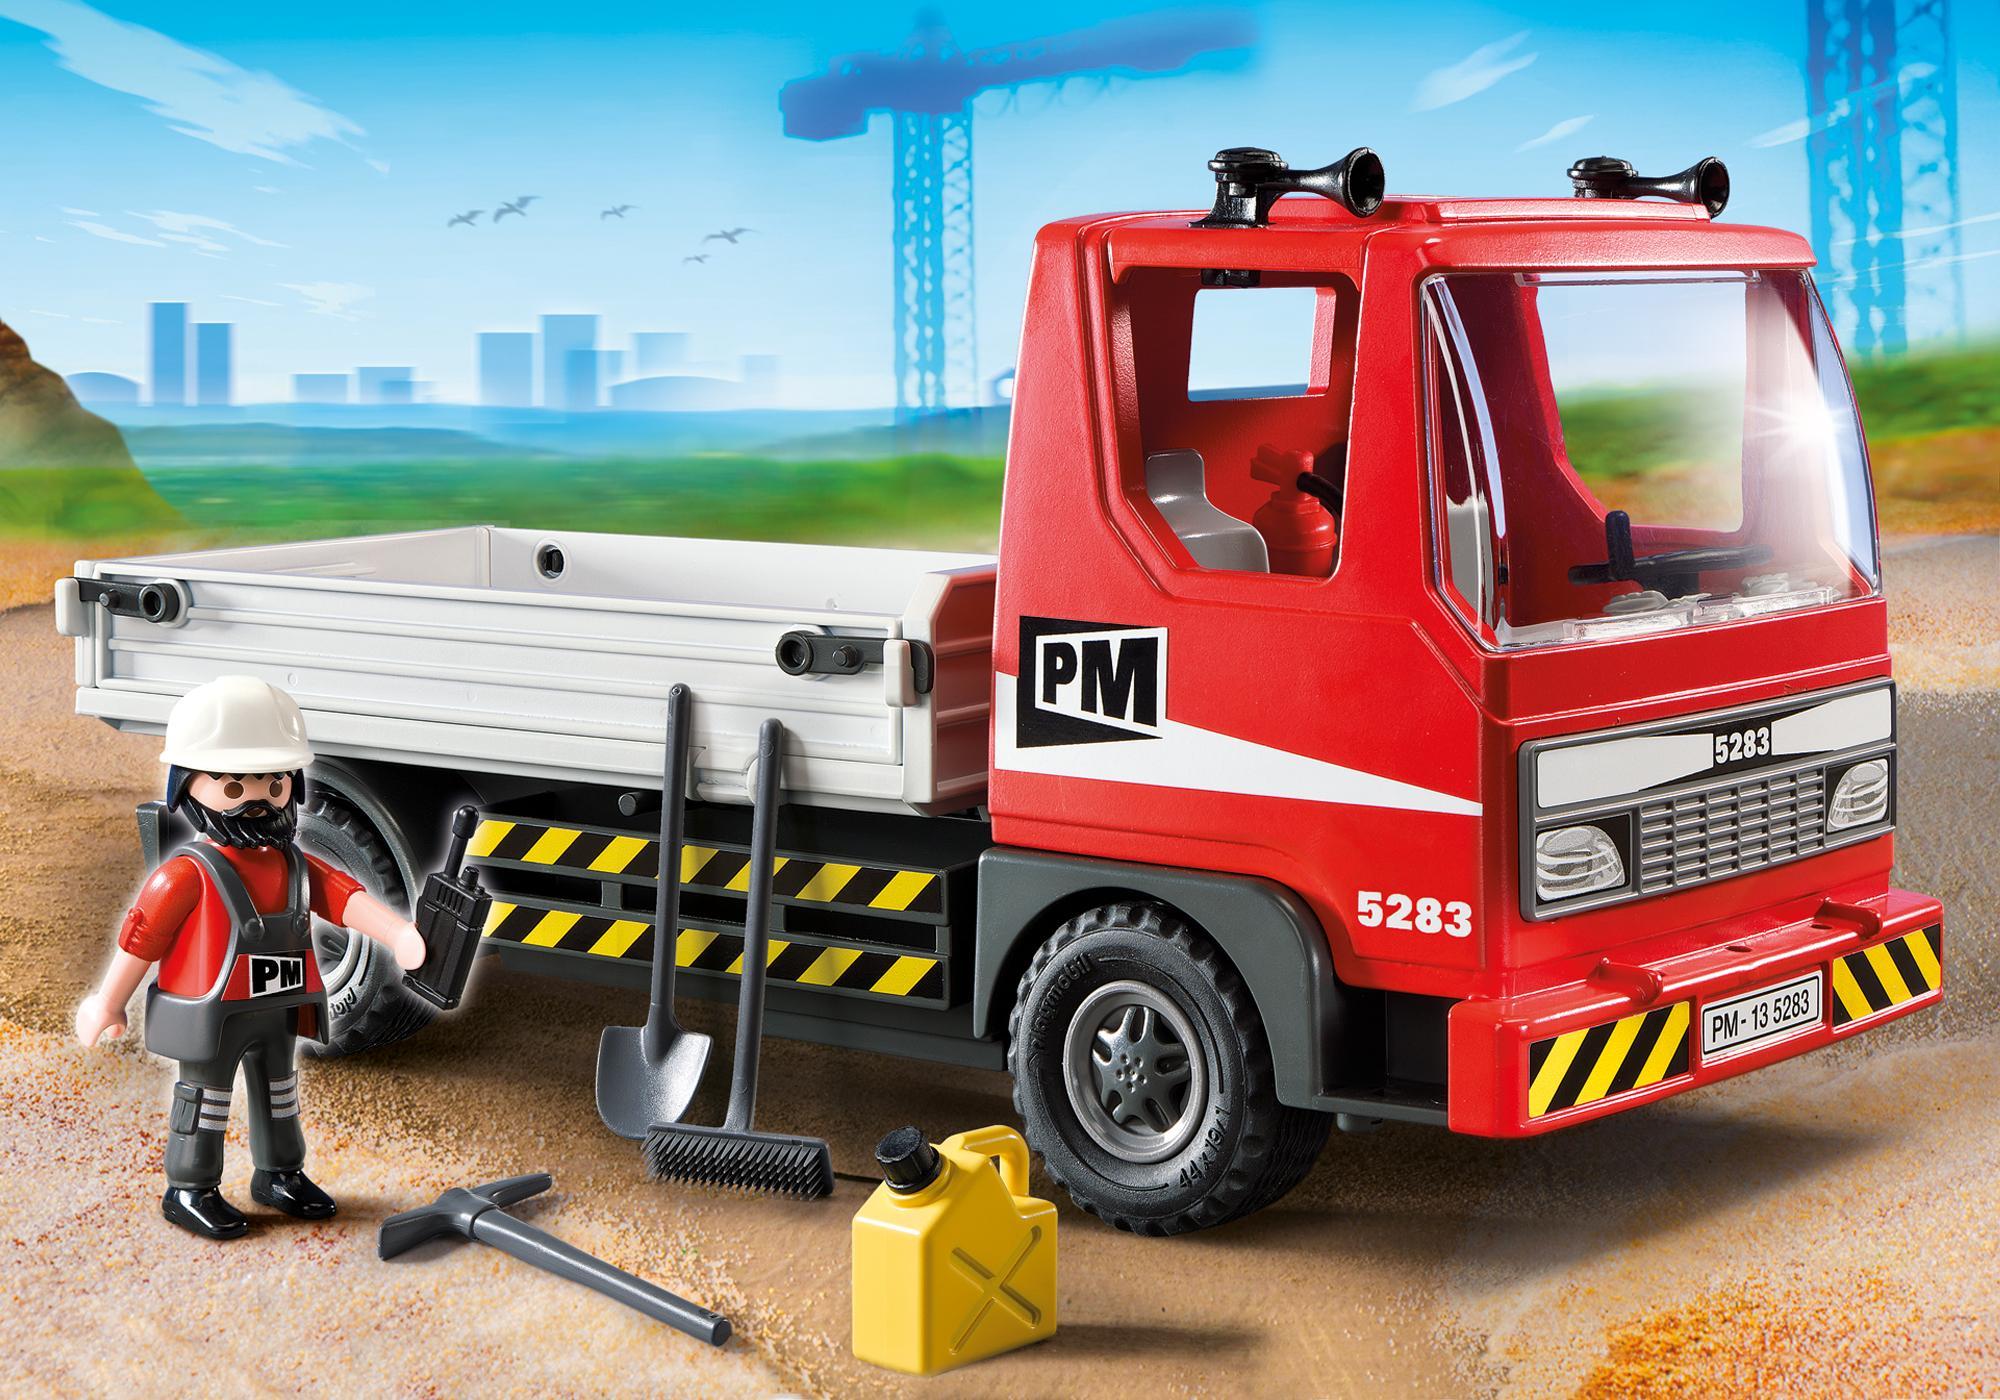 http://media.playmobil.com/i/playmobil/5283-A_product_detail/Baustellen-LKW